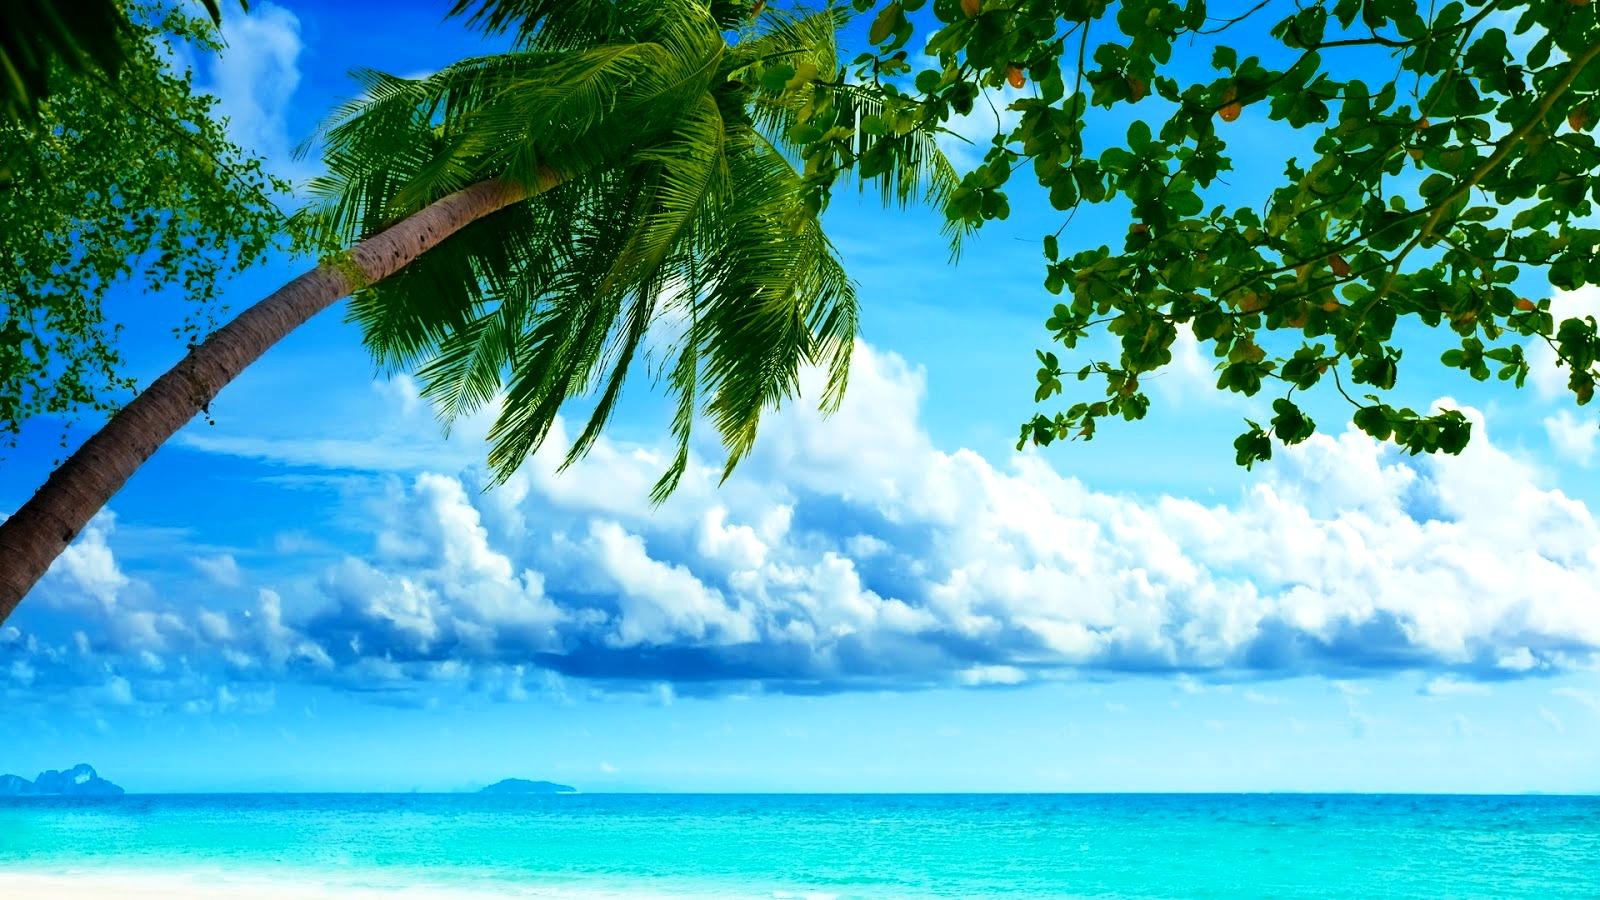 Summer Screensavers And Wallpaper Beautiful Summer 1600x900